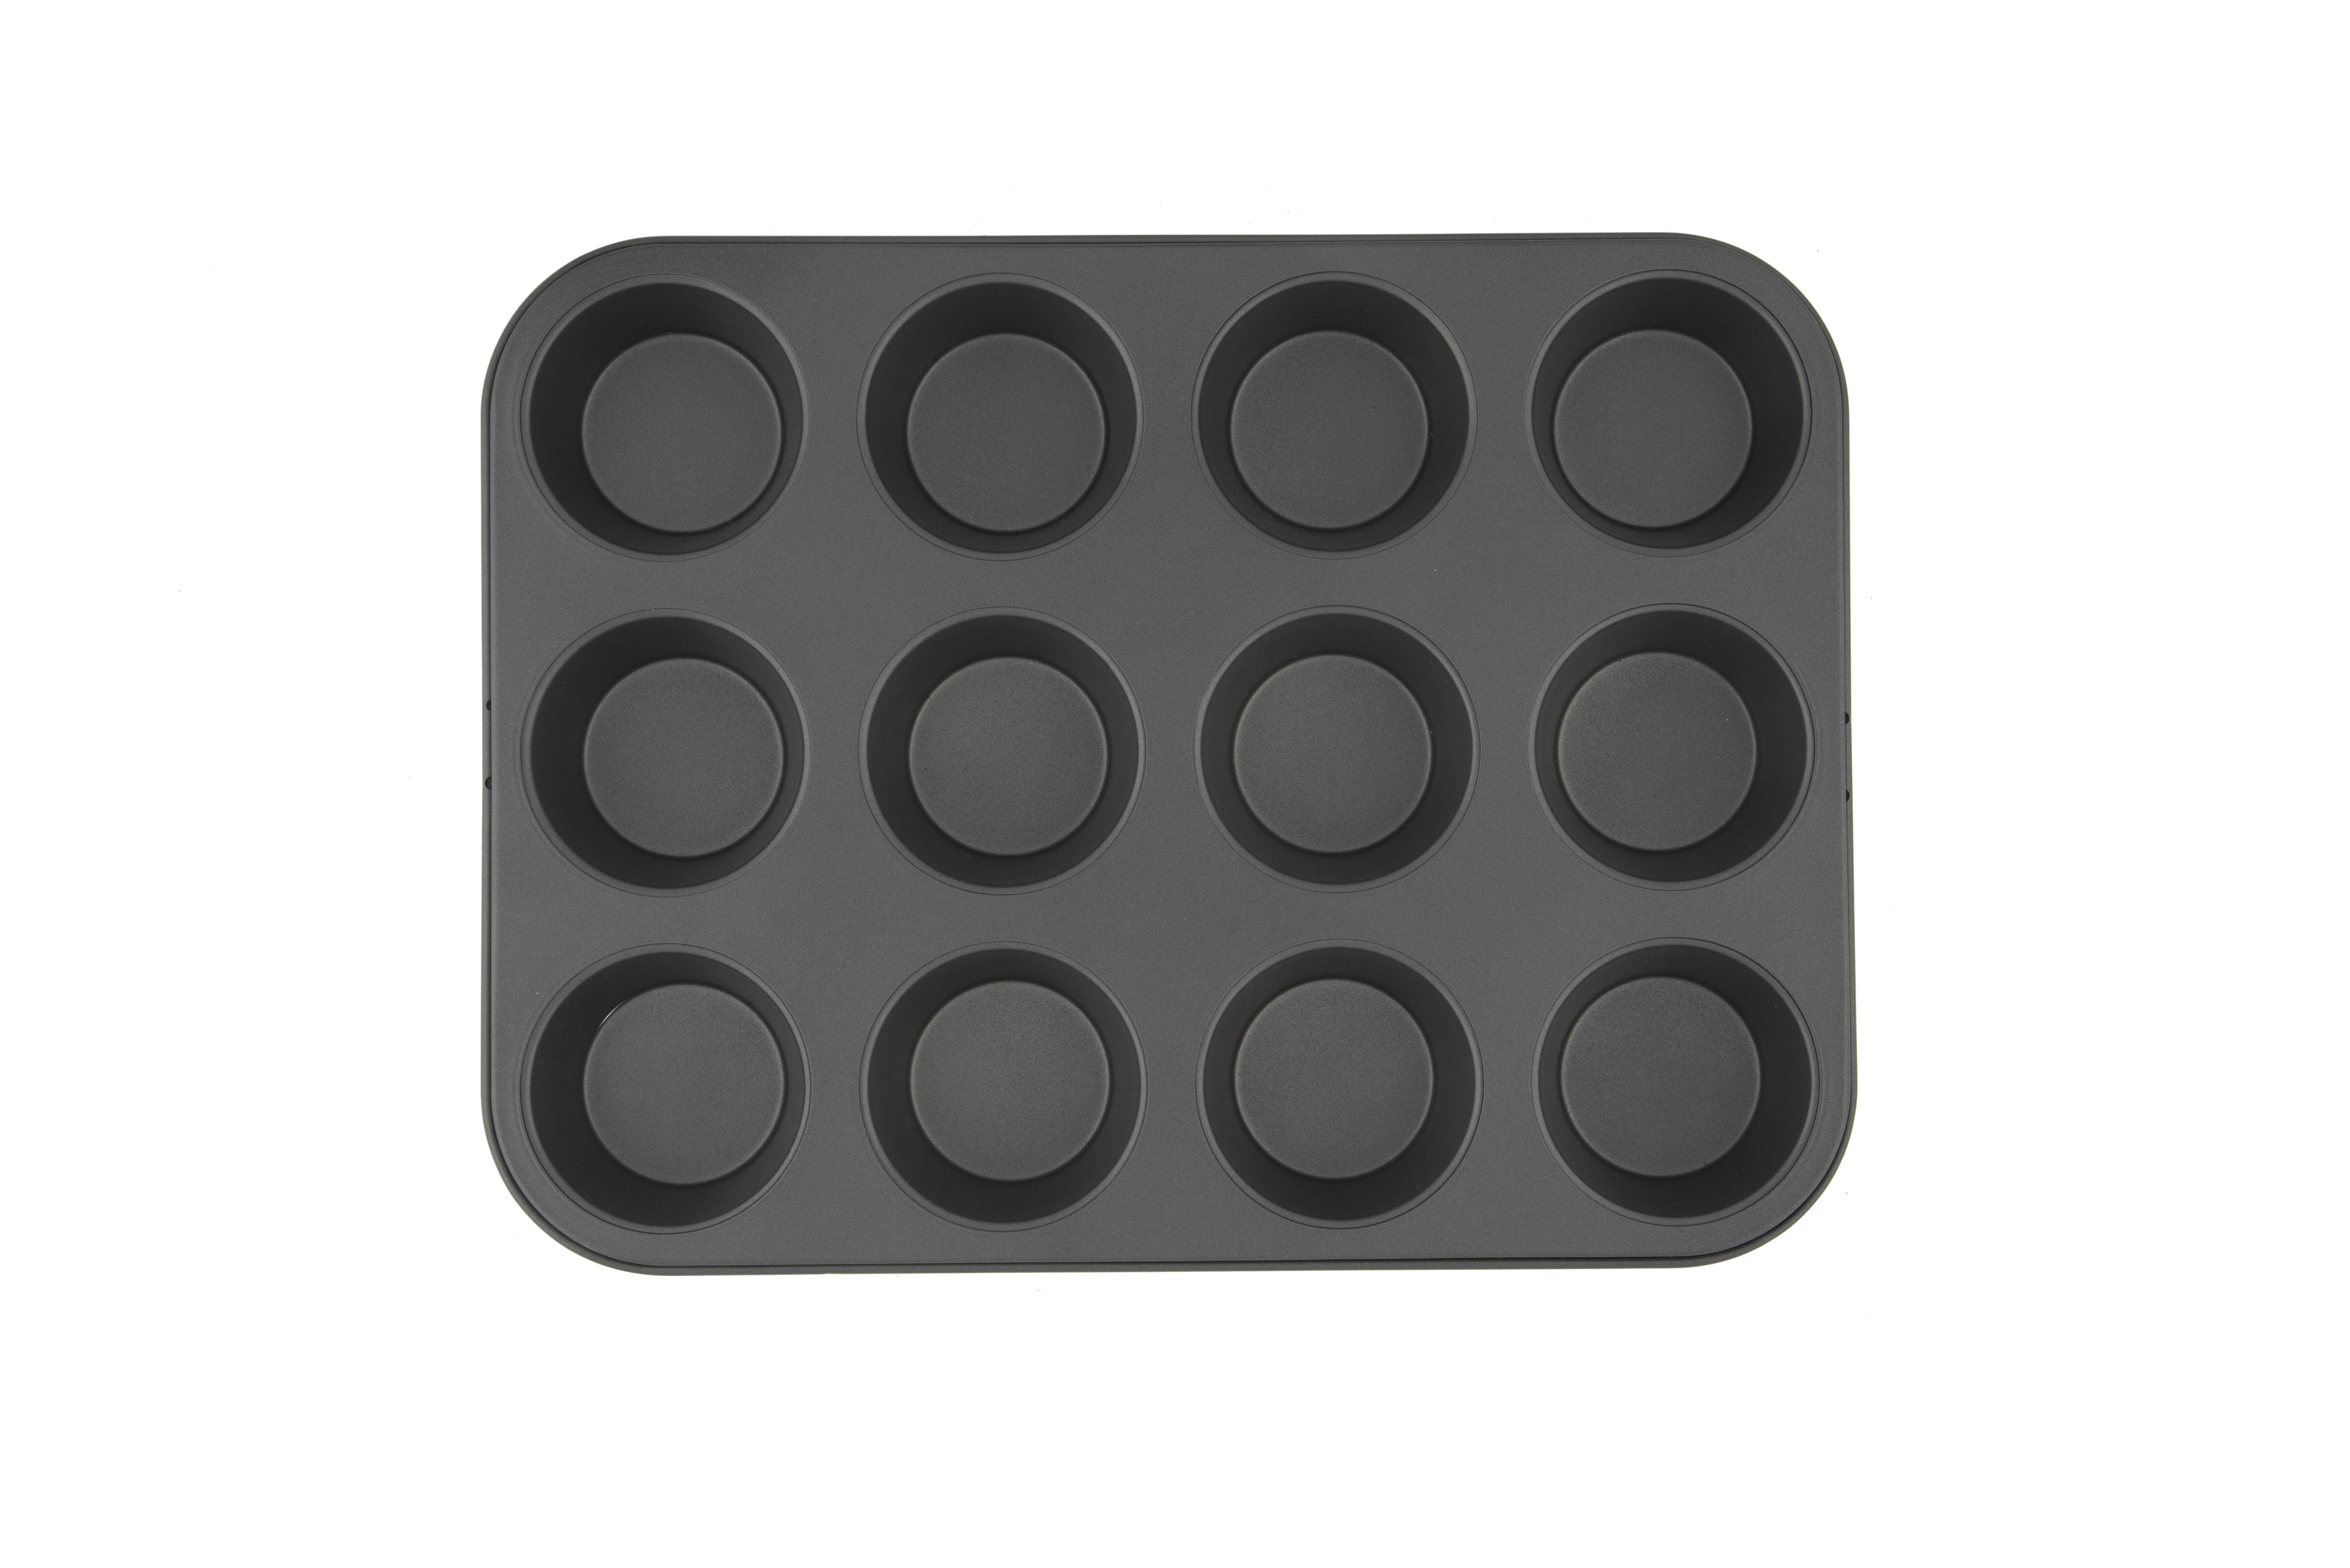 2d9a4446 muffin12b katopsi